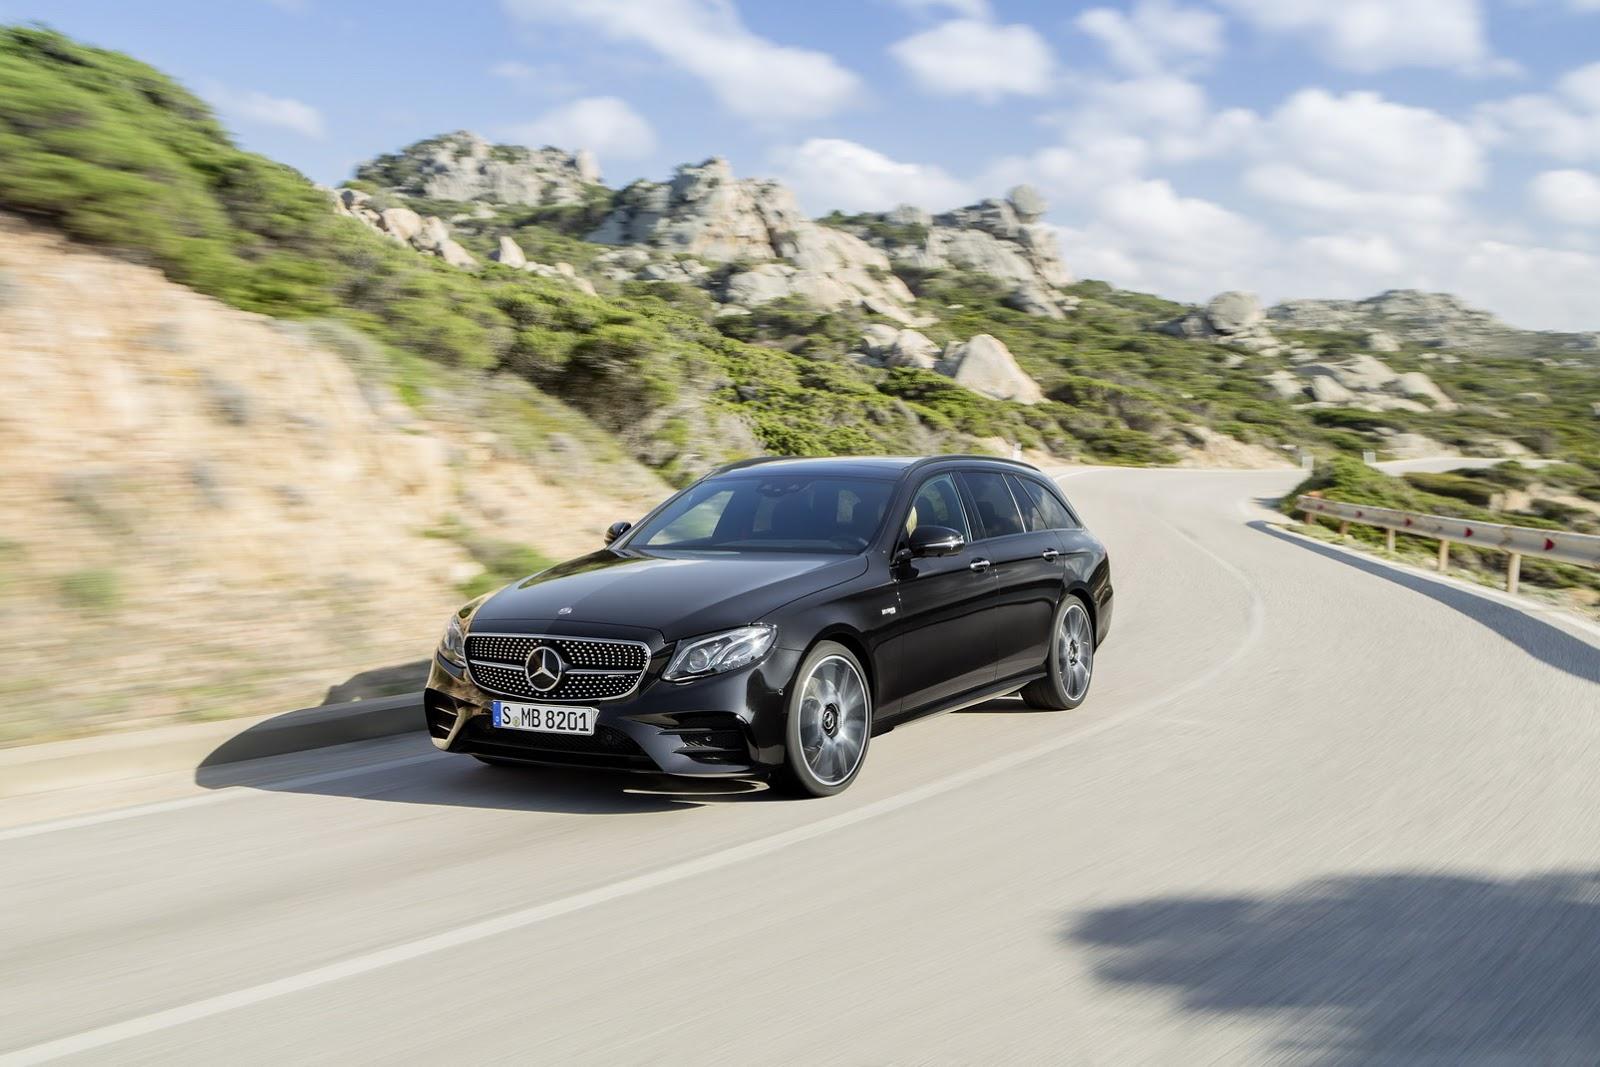 https://3.bp.blogspot.com/-TUp-PjZNGRw/V1WJCLepvKI/AAAAAAABcKM/RlgcFCt7UZkunsOzpKudPFjsBaUUtSQ6QCLcB/s1600/Mercedes-AMG-E43-Estate-3.jpg